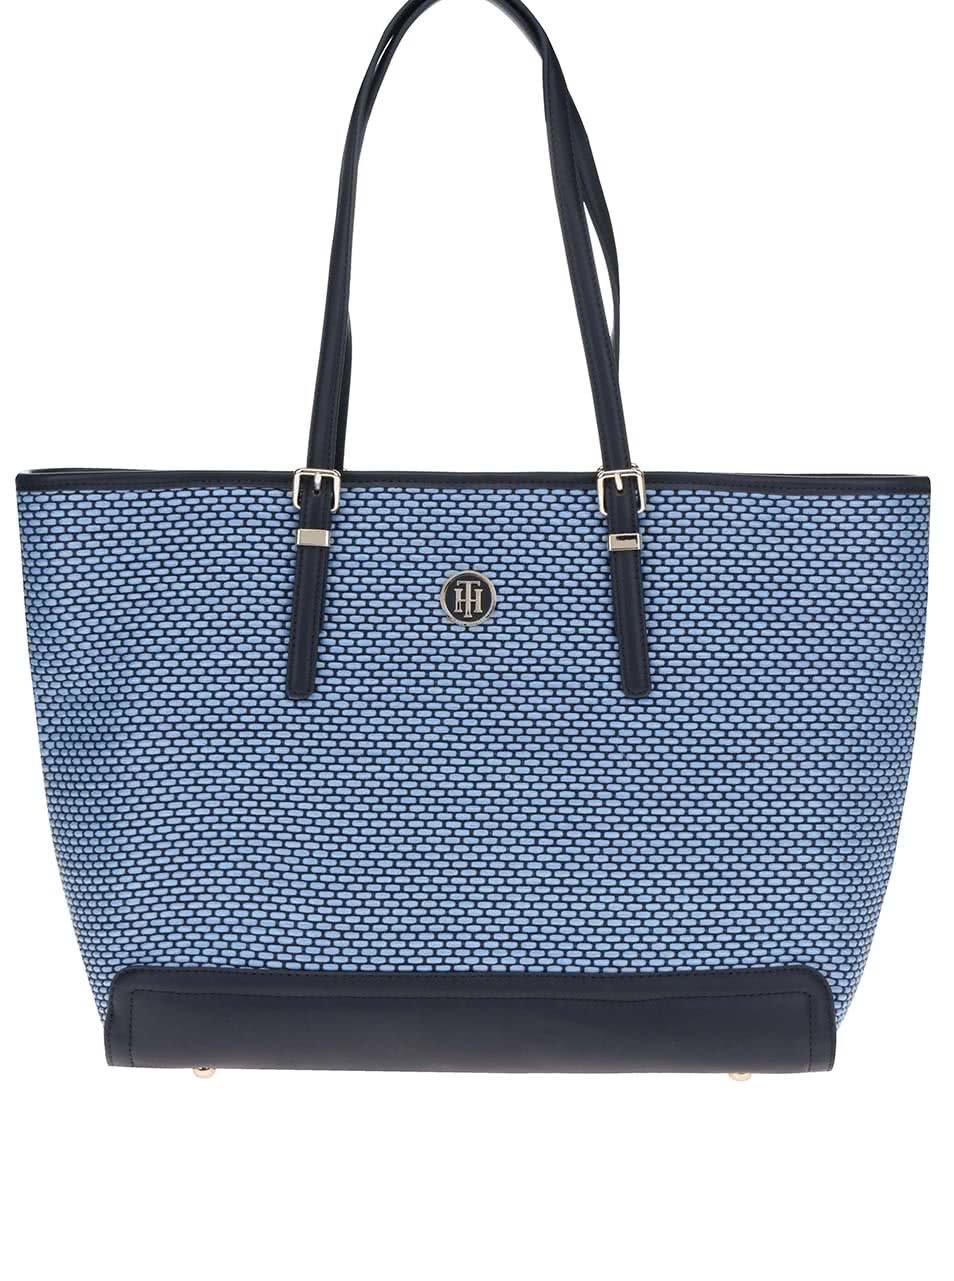 e429ed3417 Modrá veľká kabelka do ruky Tommy Hilfiger ...